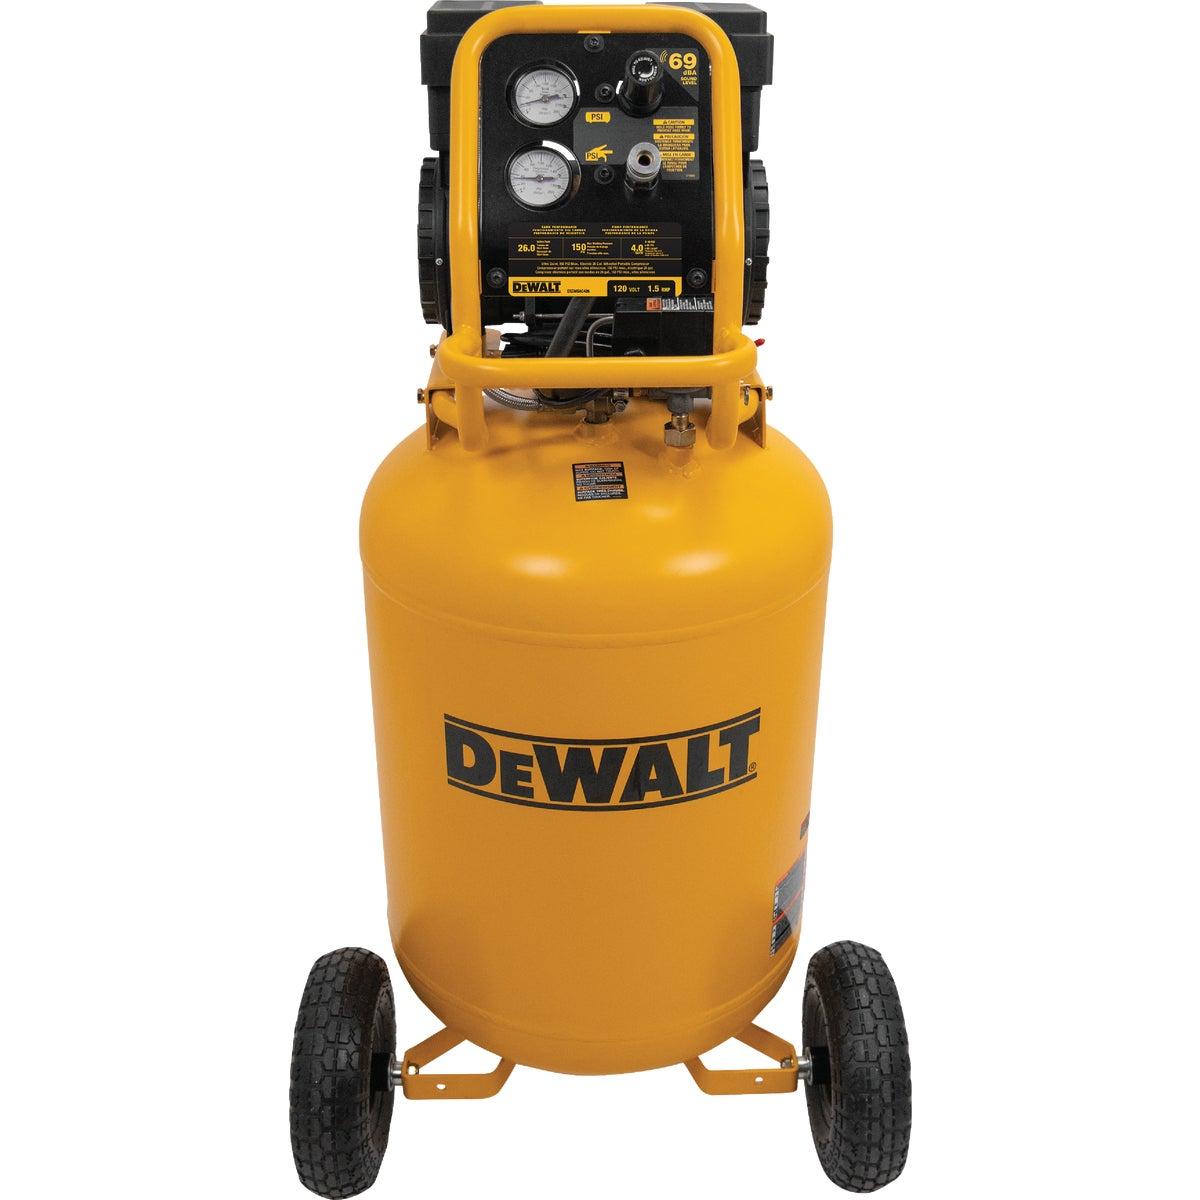 Campbell Hausfeld 26 Gal. Air Compressor